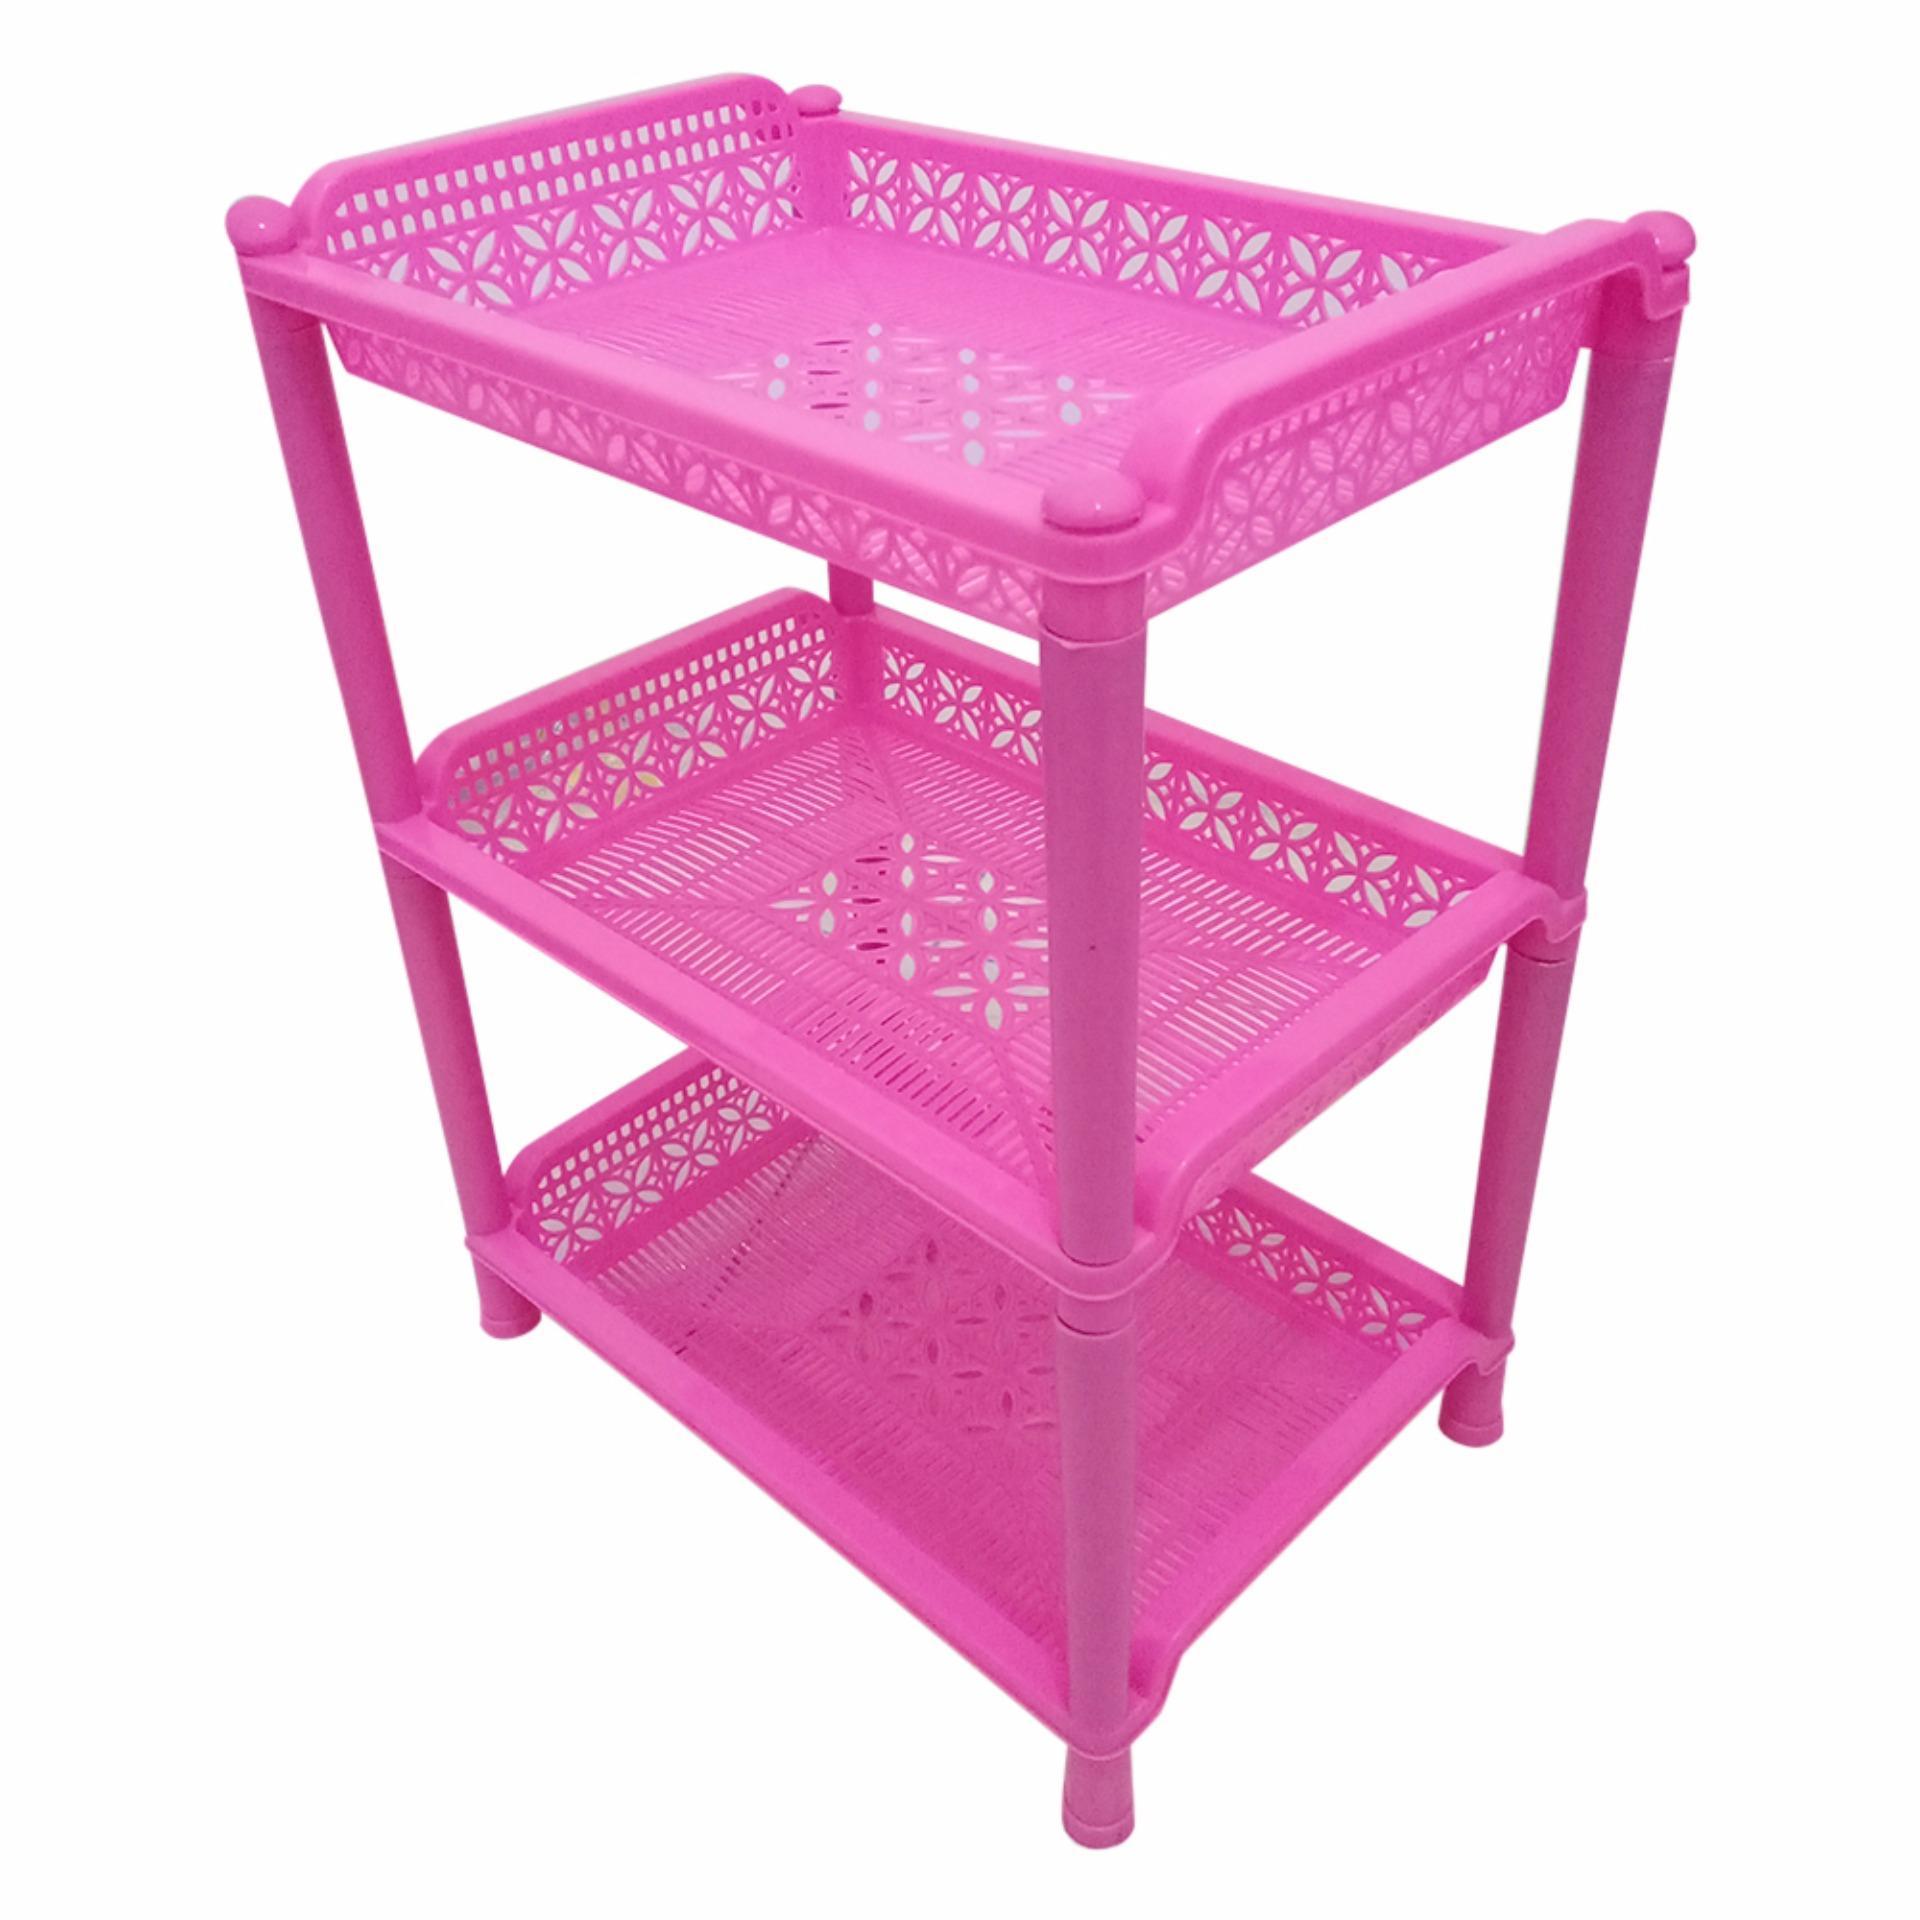 Multiplast Rak Plastik Serbaguna Susun 3 - Pink By Toko David.